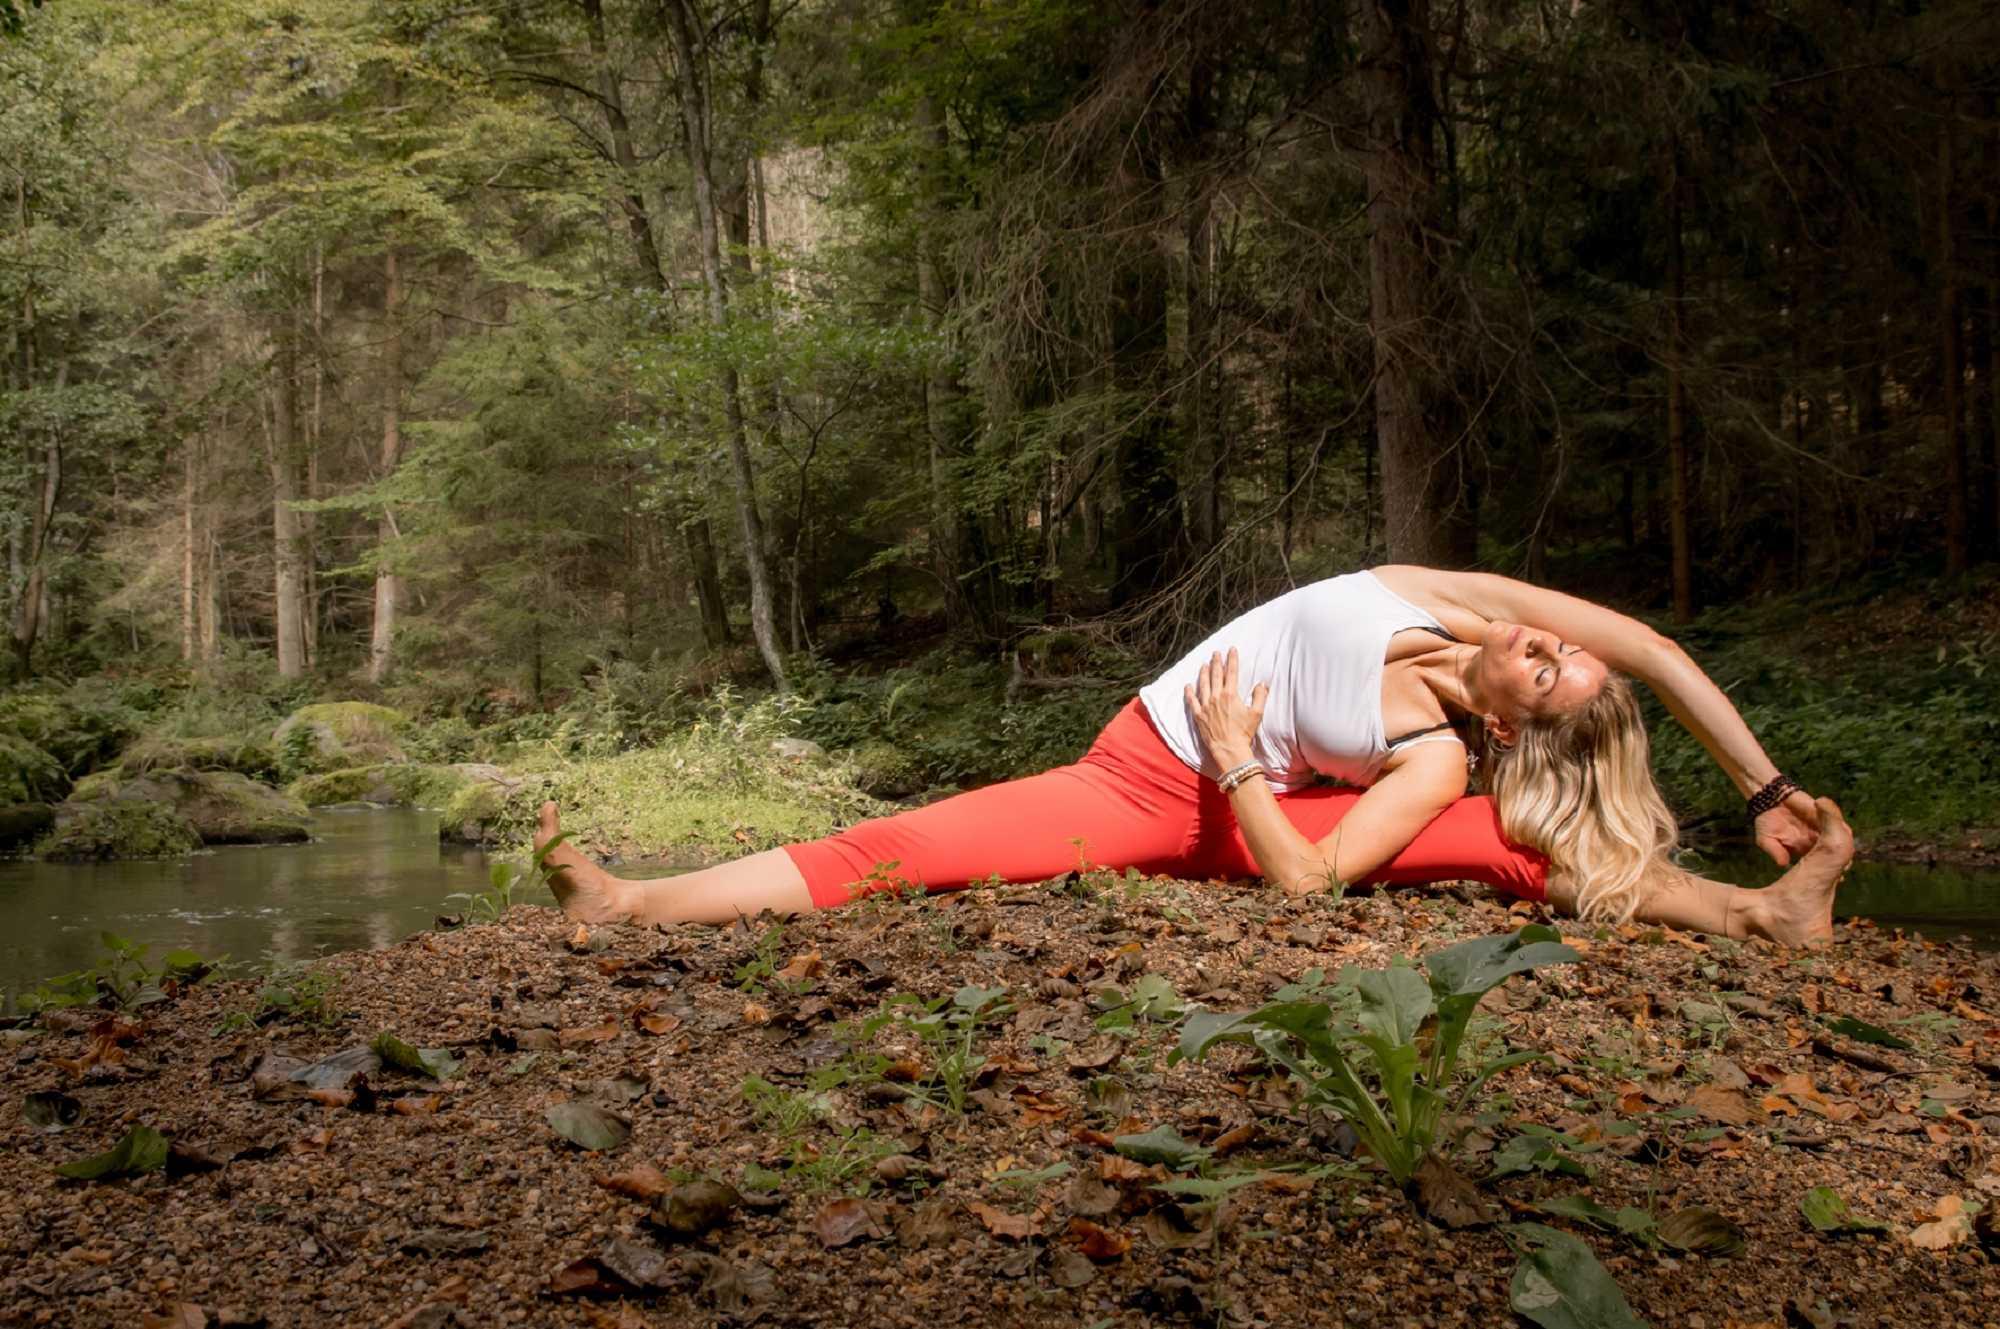 Yogaangebote im designhotel das goldberg in sterreich for Designhotel yoga